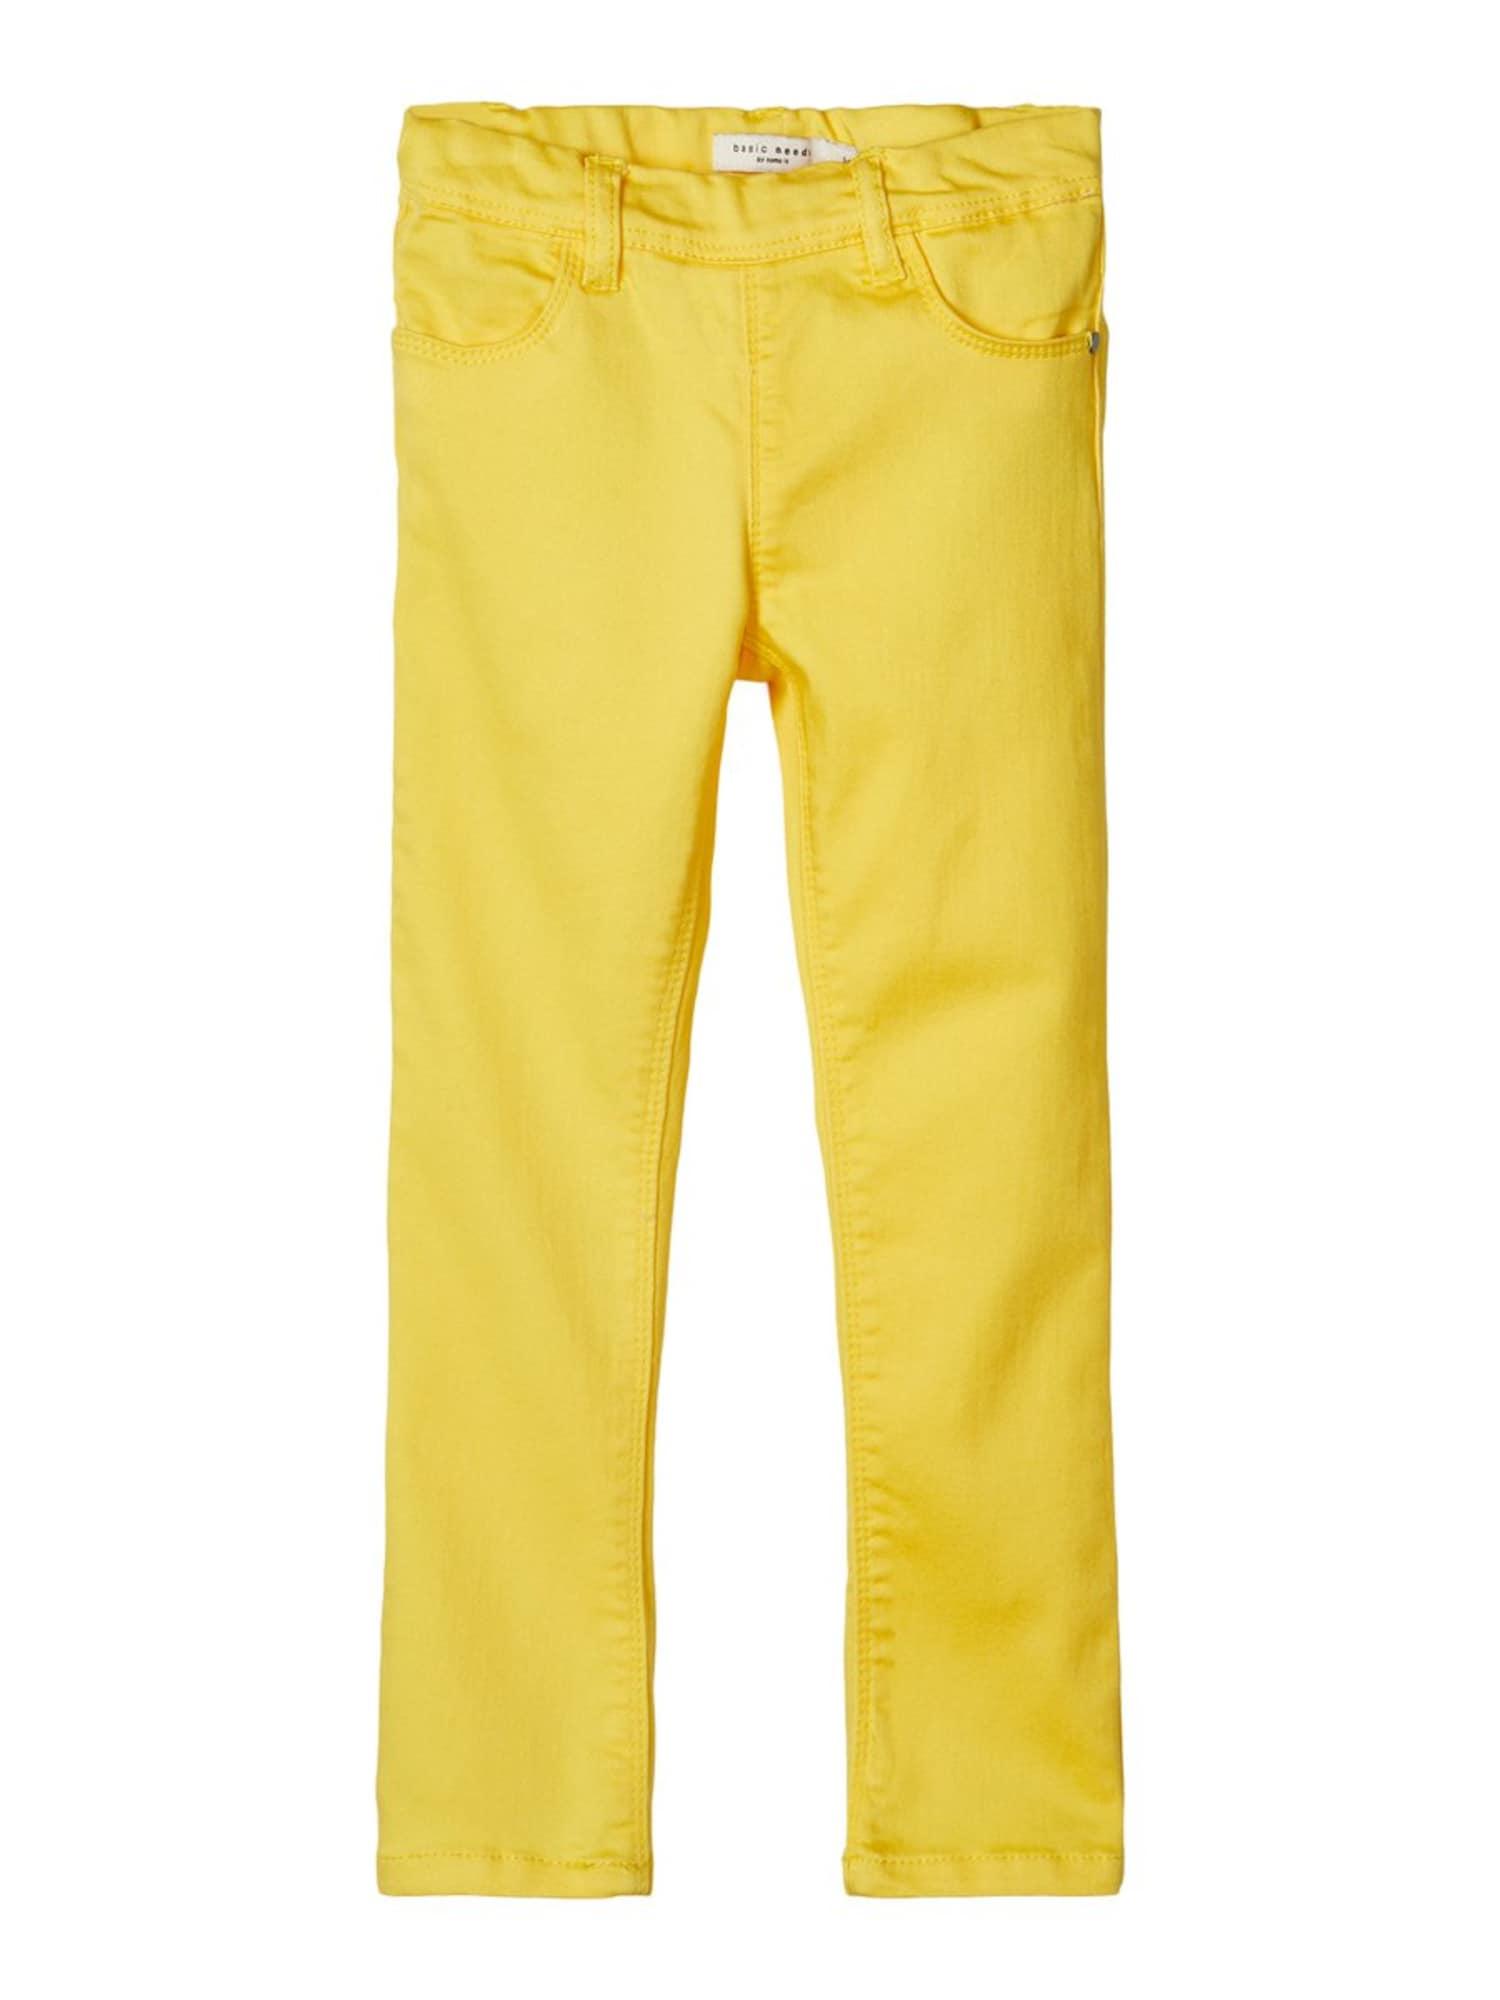 NAME IT Tamprės 'Thea Twiatinna' geltona